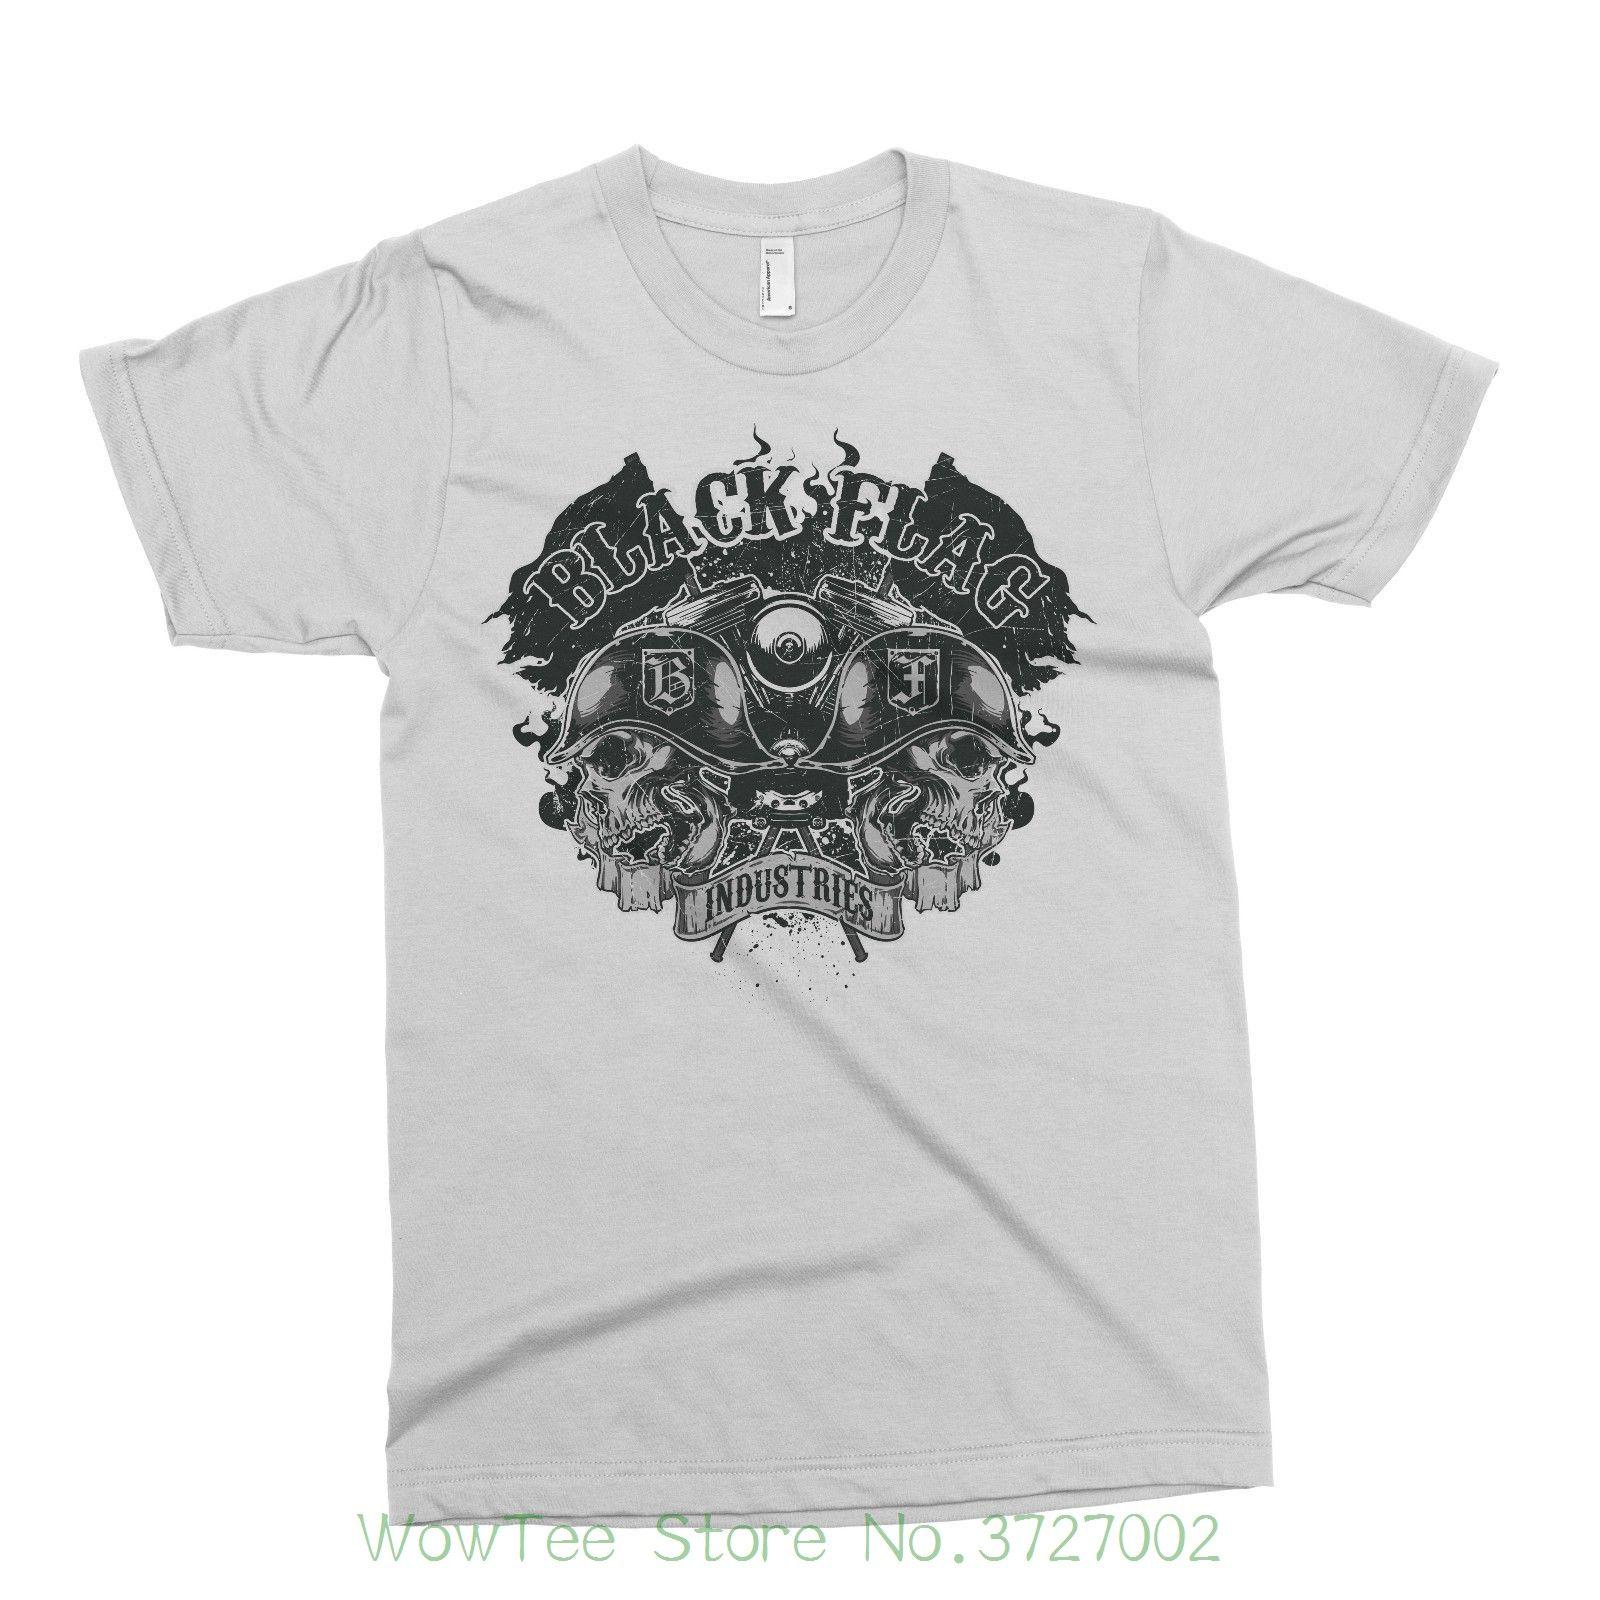 Acquista Flag Zombie Asylum T Shirt Tattoo Black Industries nP0vN8mwOy